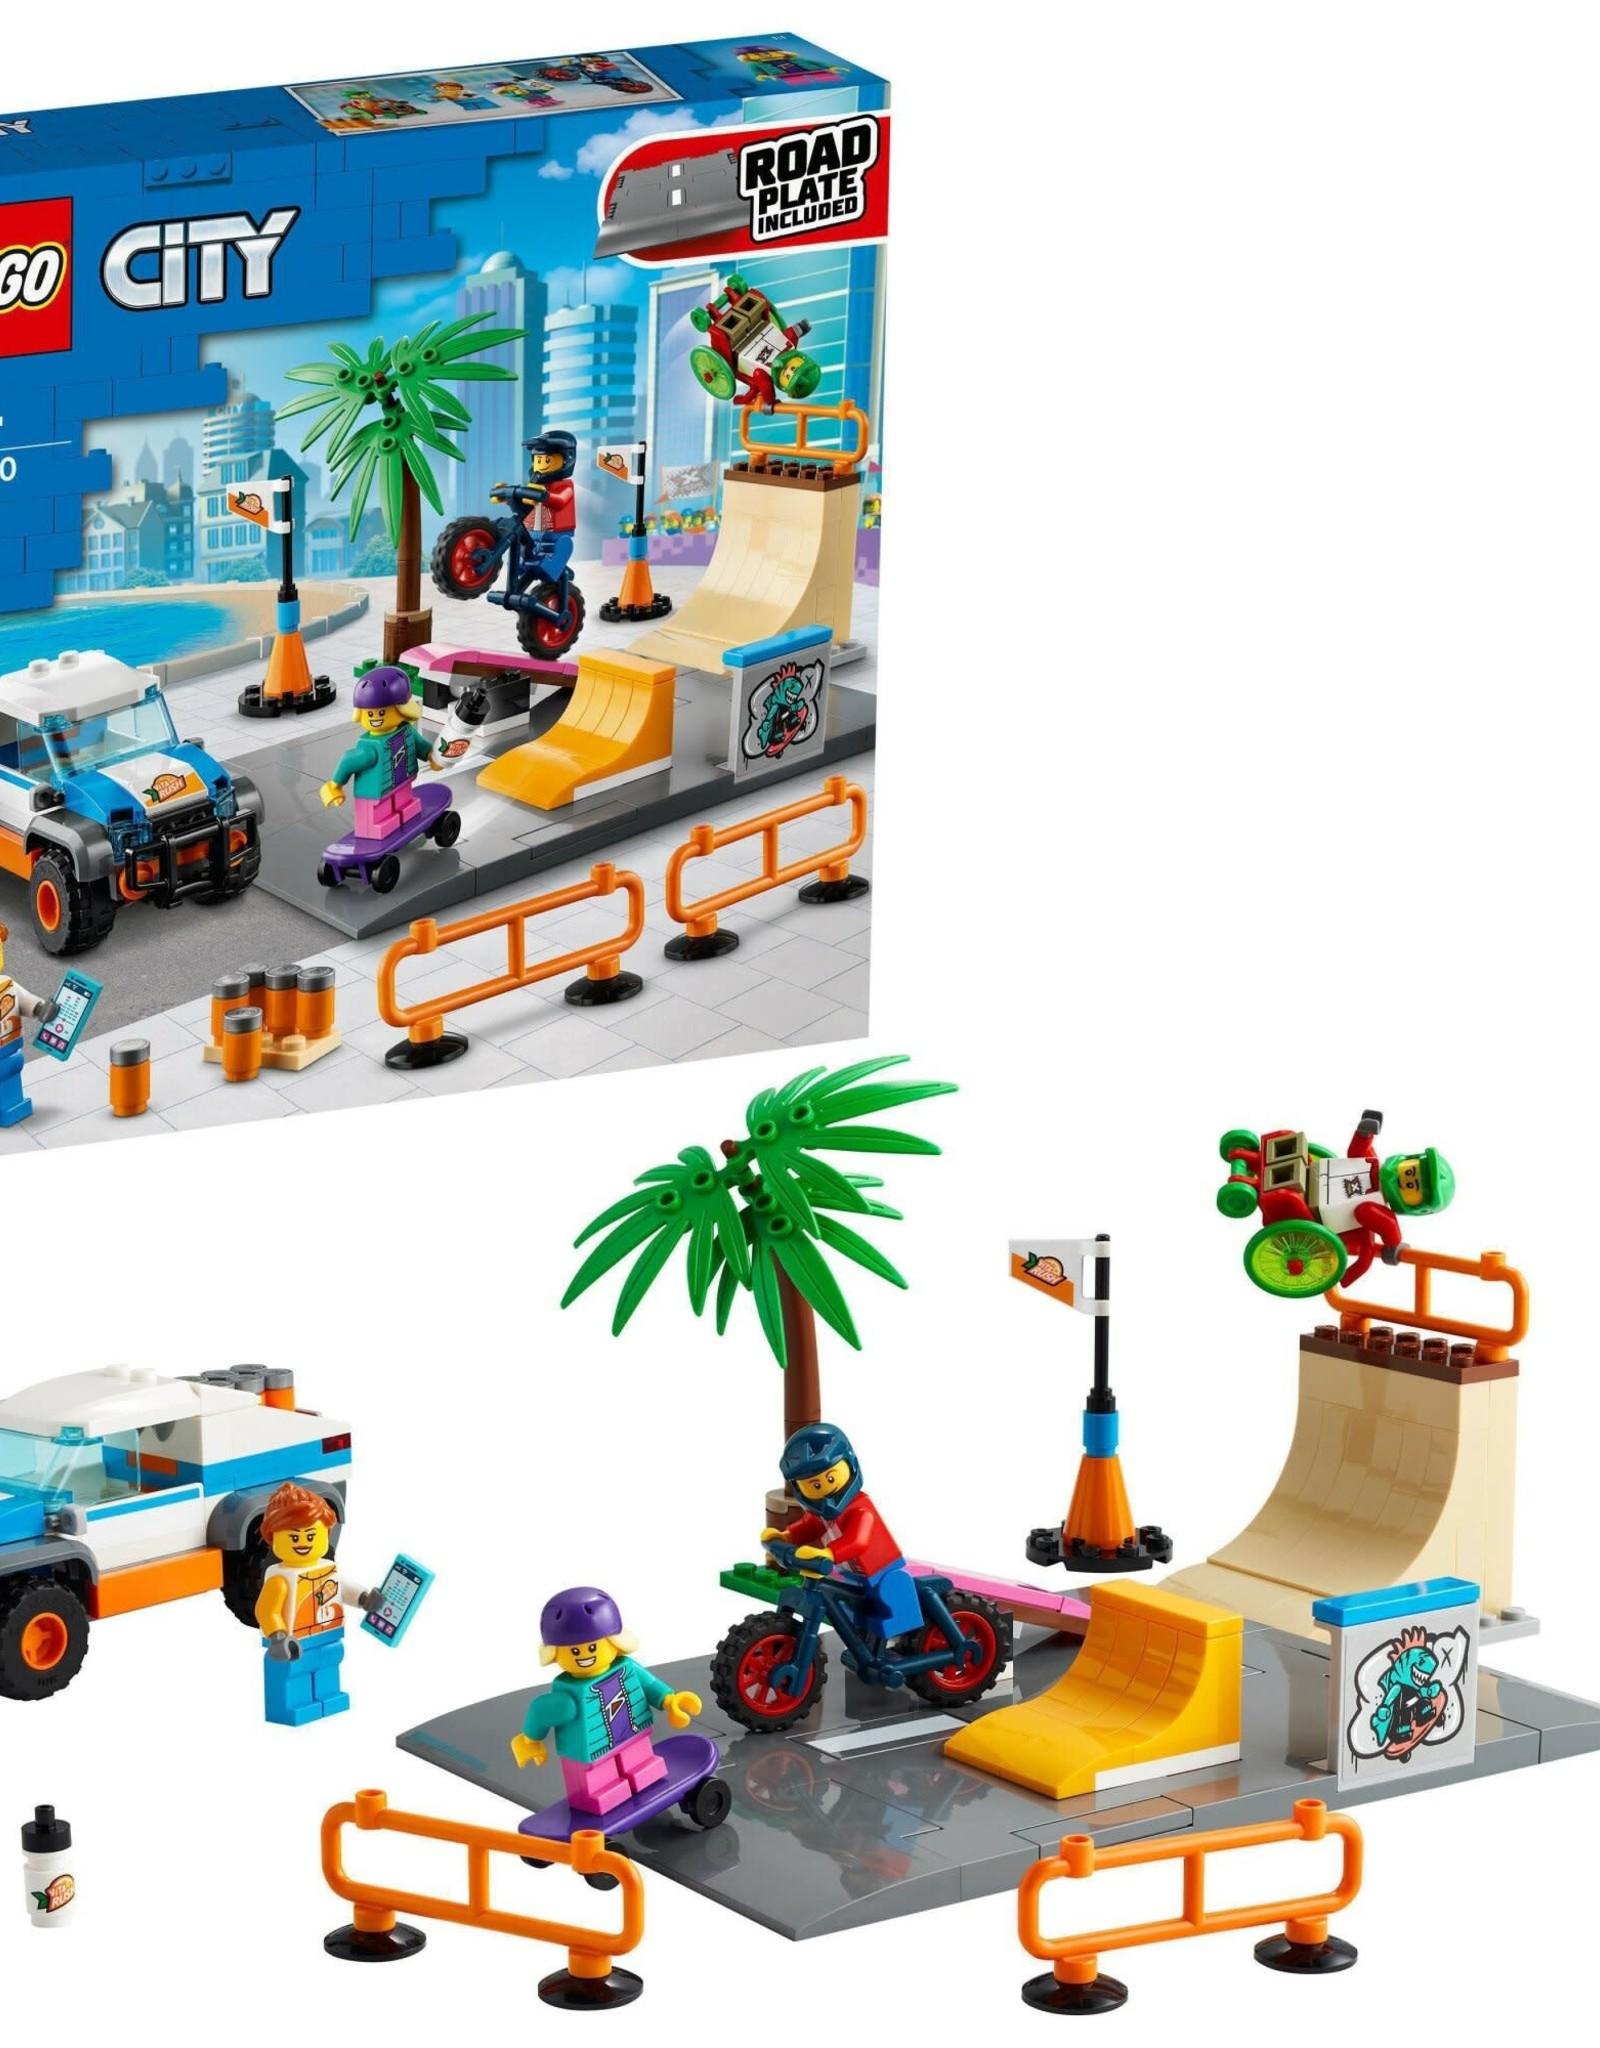 LEGO 60290 Skate Park